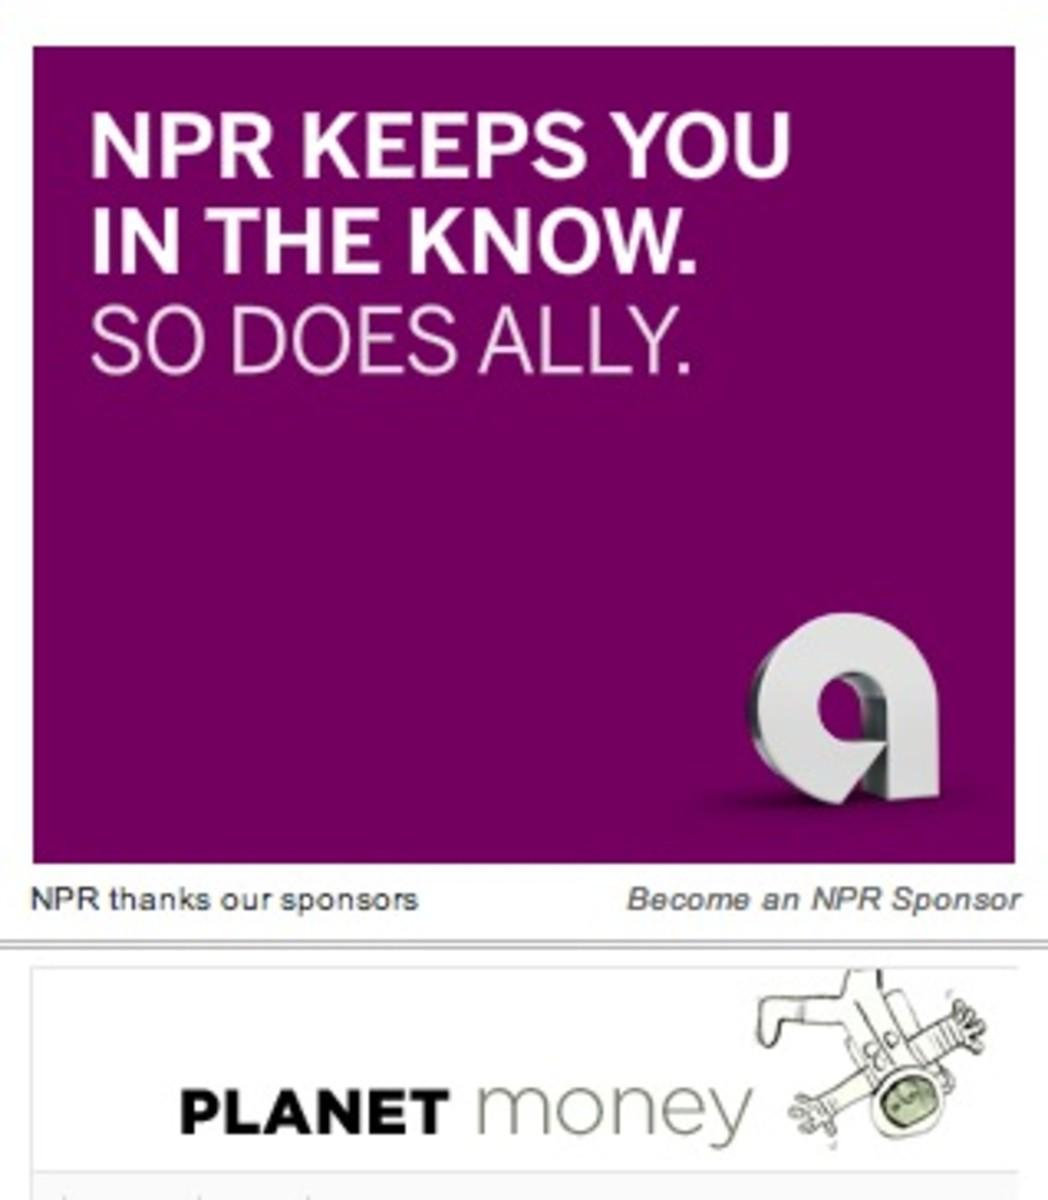 planet-money-ally-bank-exclusive sponsor